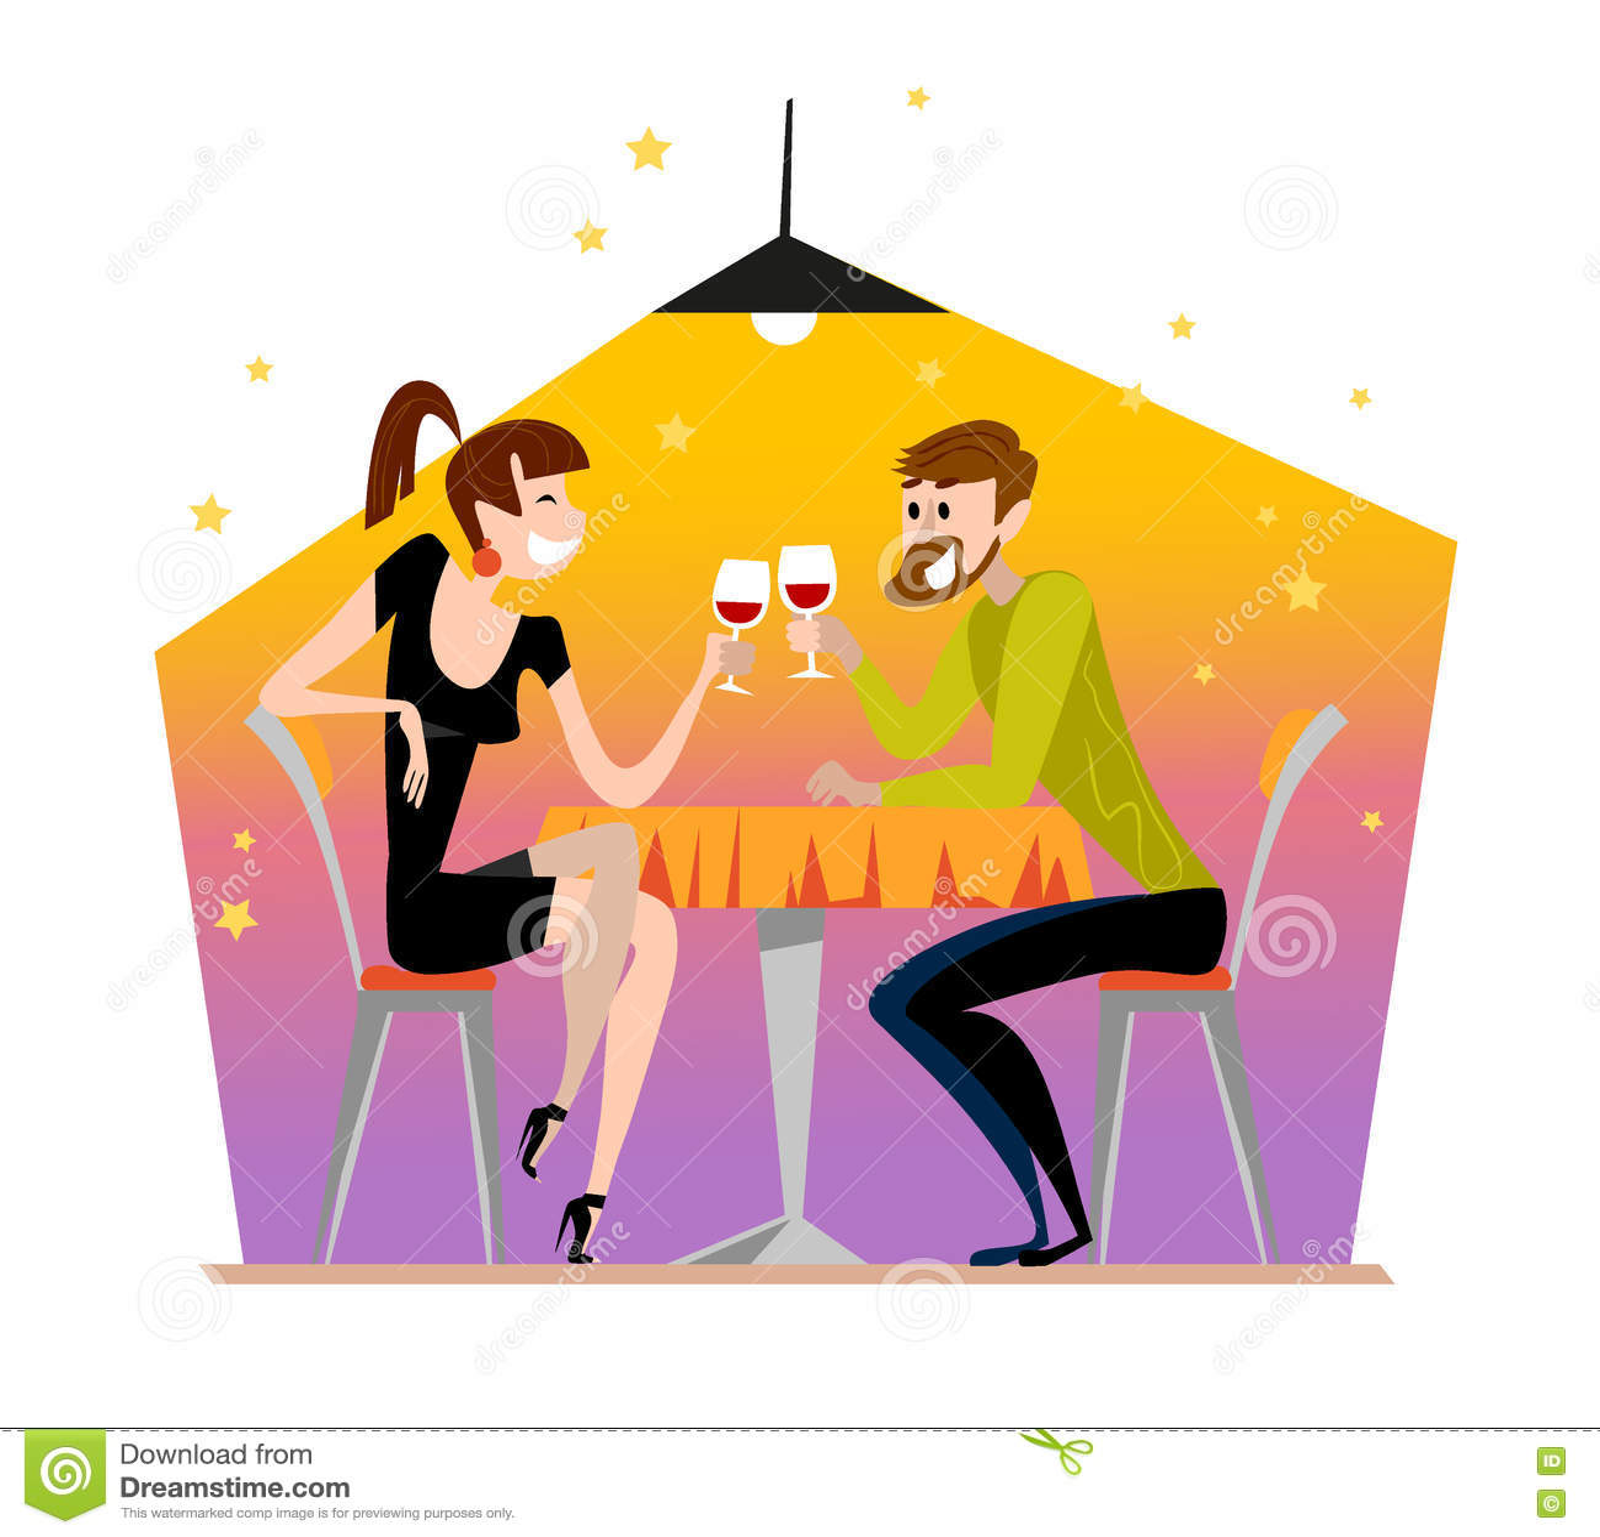 Cartoon restaurant free vector graphic download - Vector Flat Restaurant Illustration Stock Vector